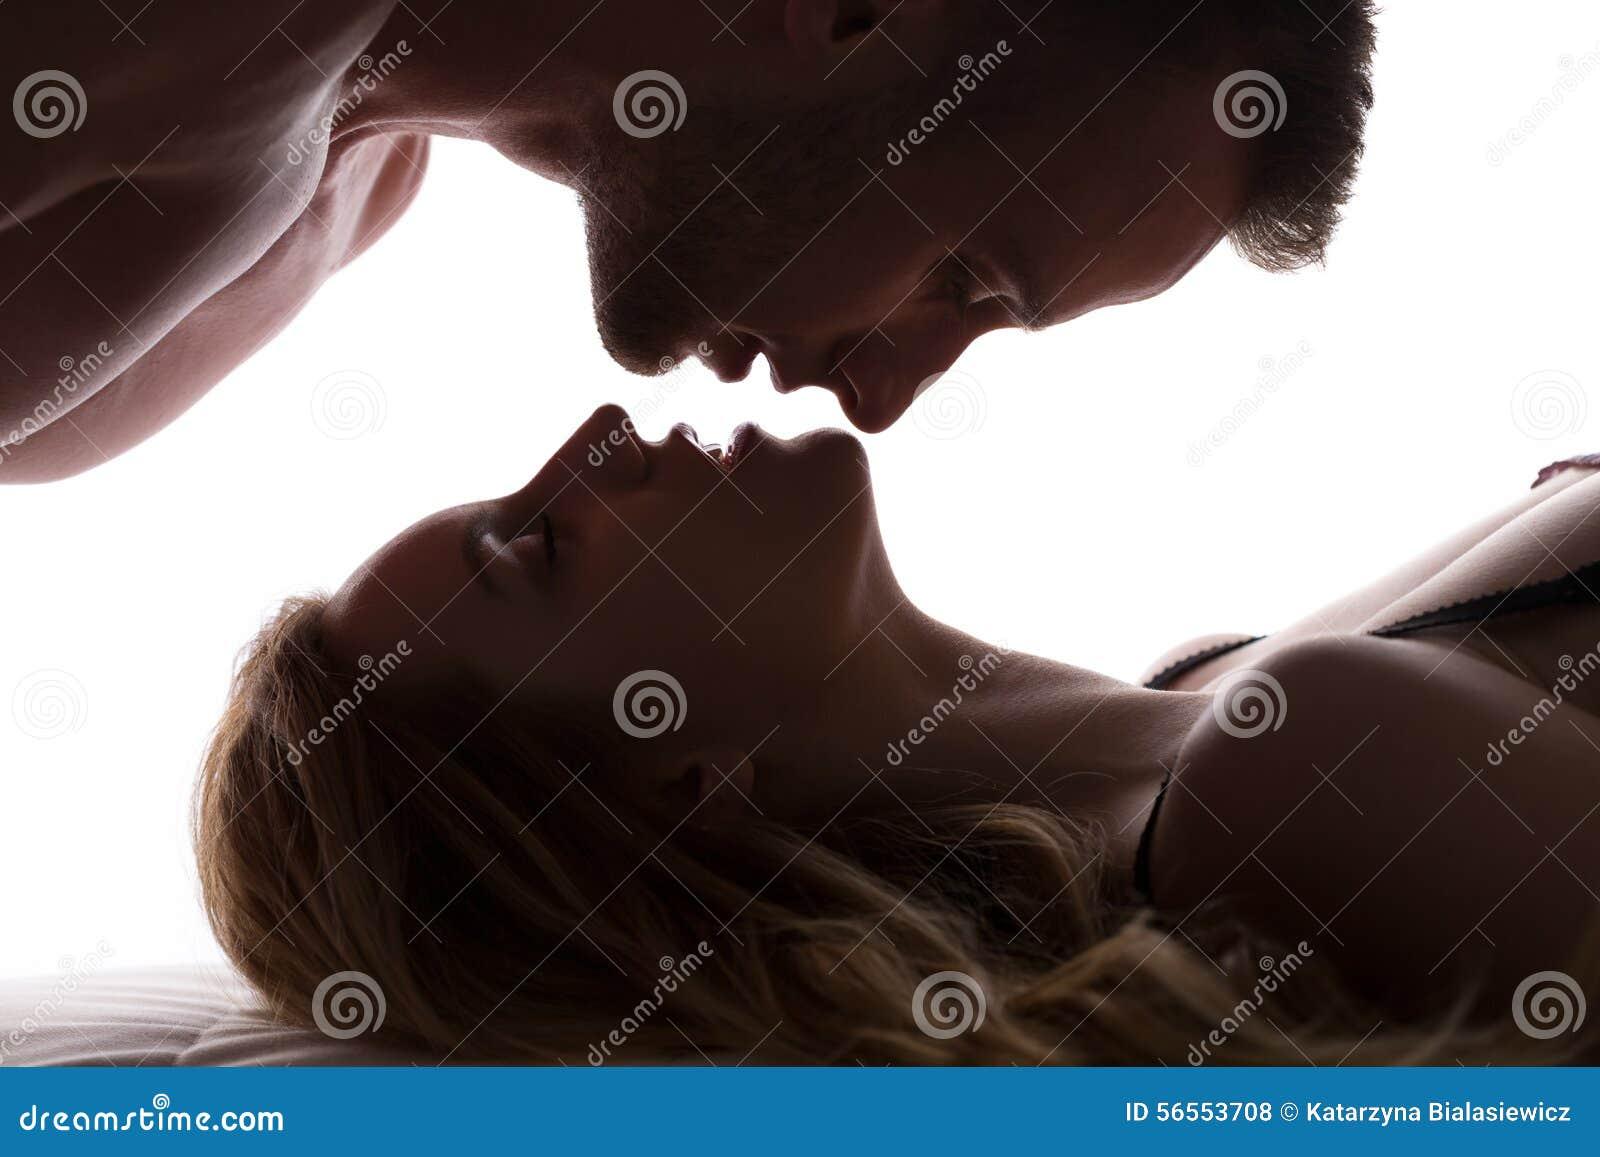 Download Ζεύγος και αντίστροφο φιλί στοκ εικόνες. εικόνα από ρωμανικός - 56553708